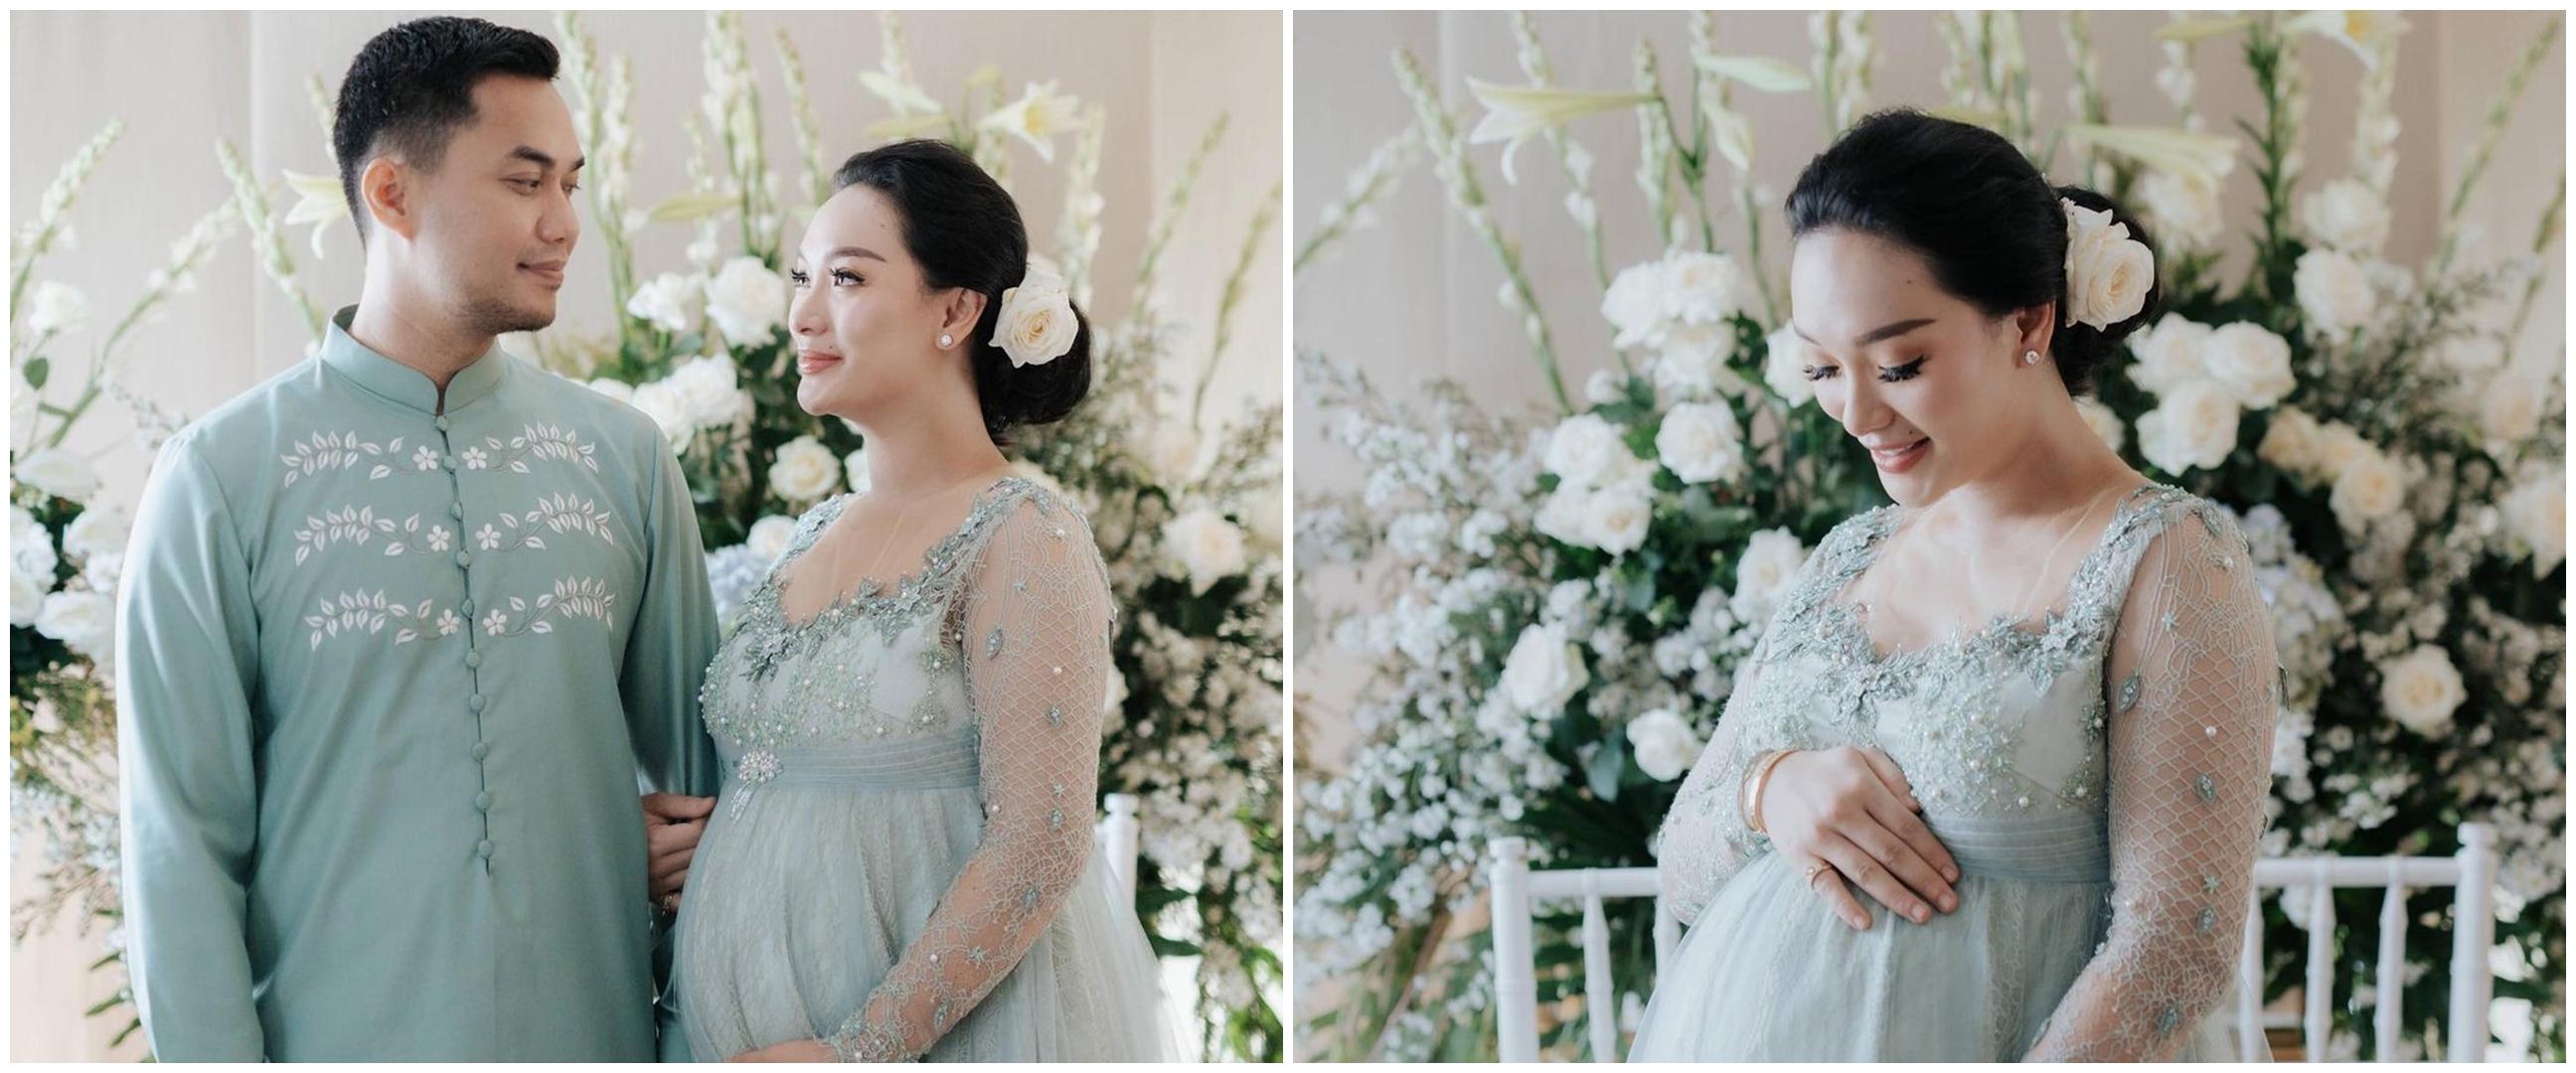 8 Perjalanan kehamilan anak pertama Zaskia Gotik, sempat jatuh sakit